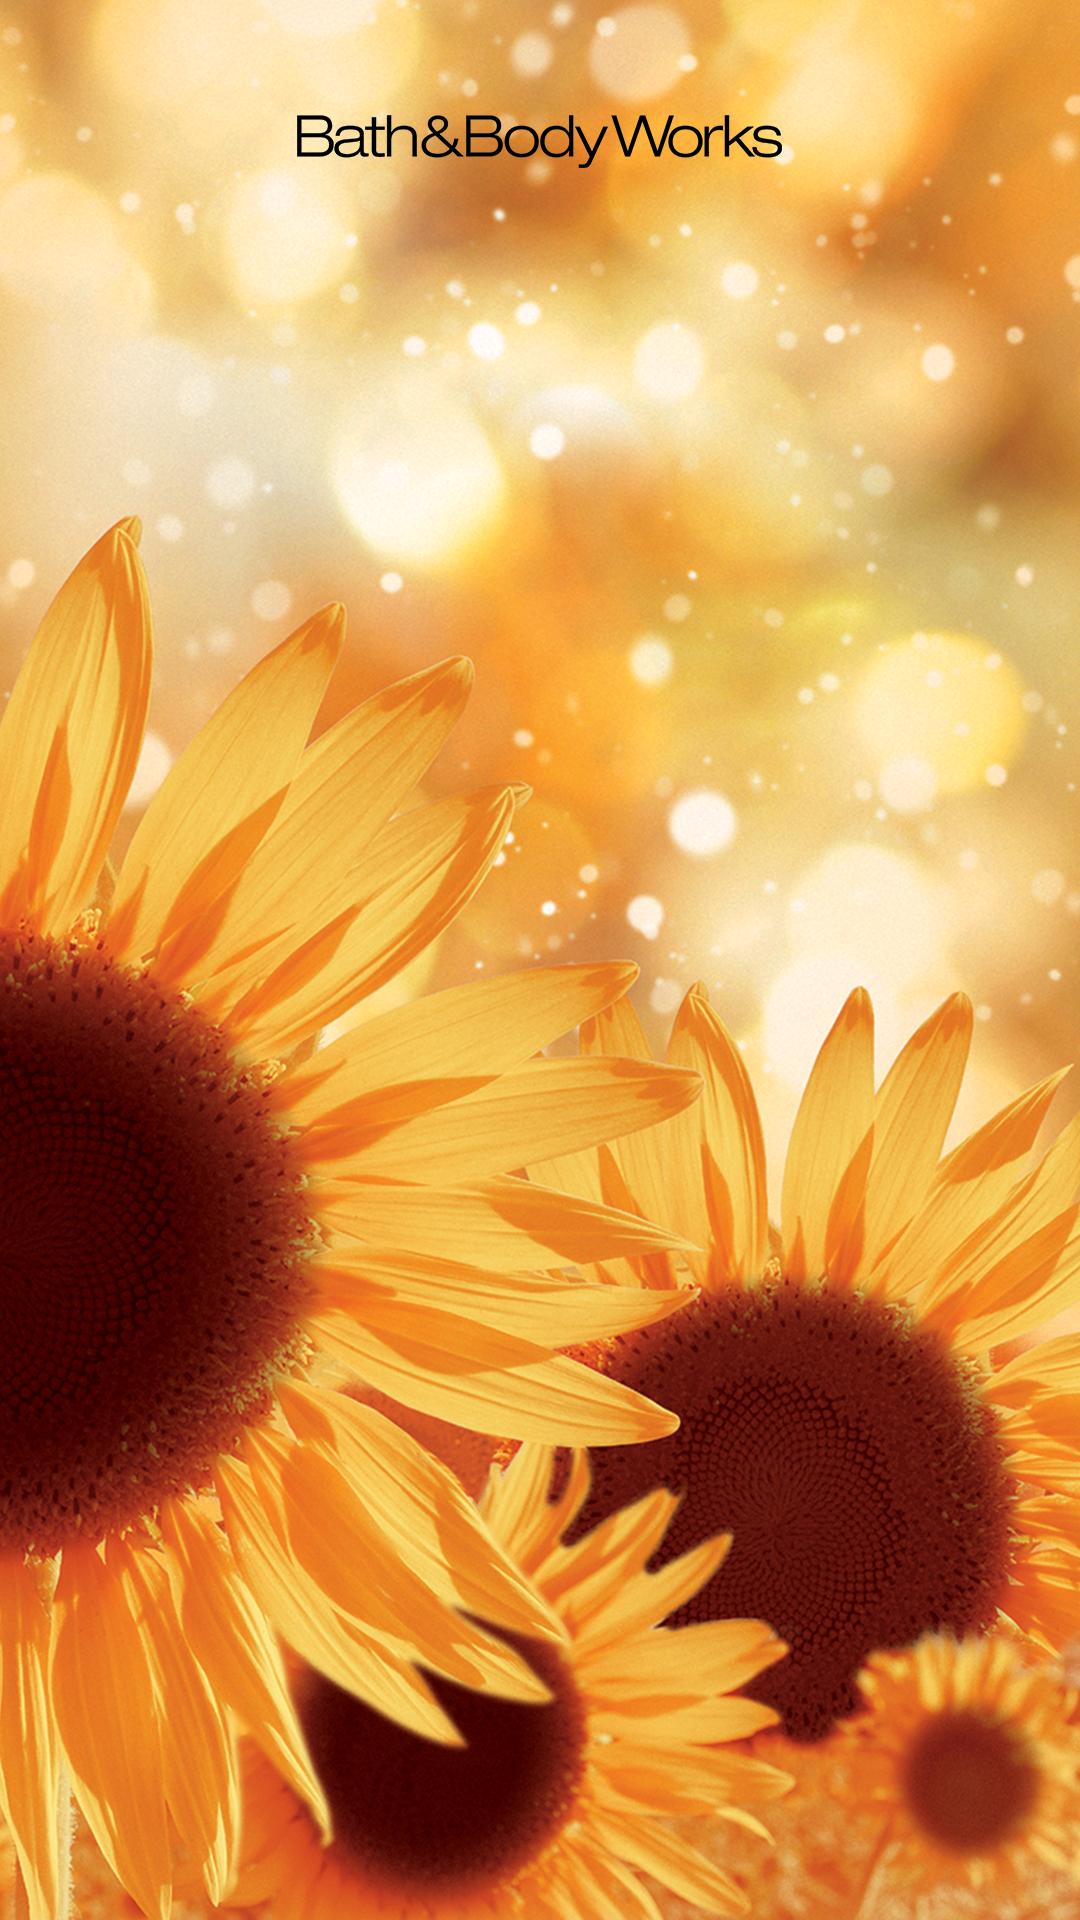 New Golden Sunflower Wallpapers In 2020 Sunflower Wallpaper Hd Flower Wallpaper Wallpaper